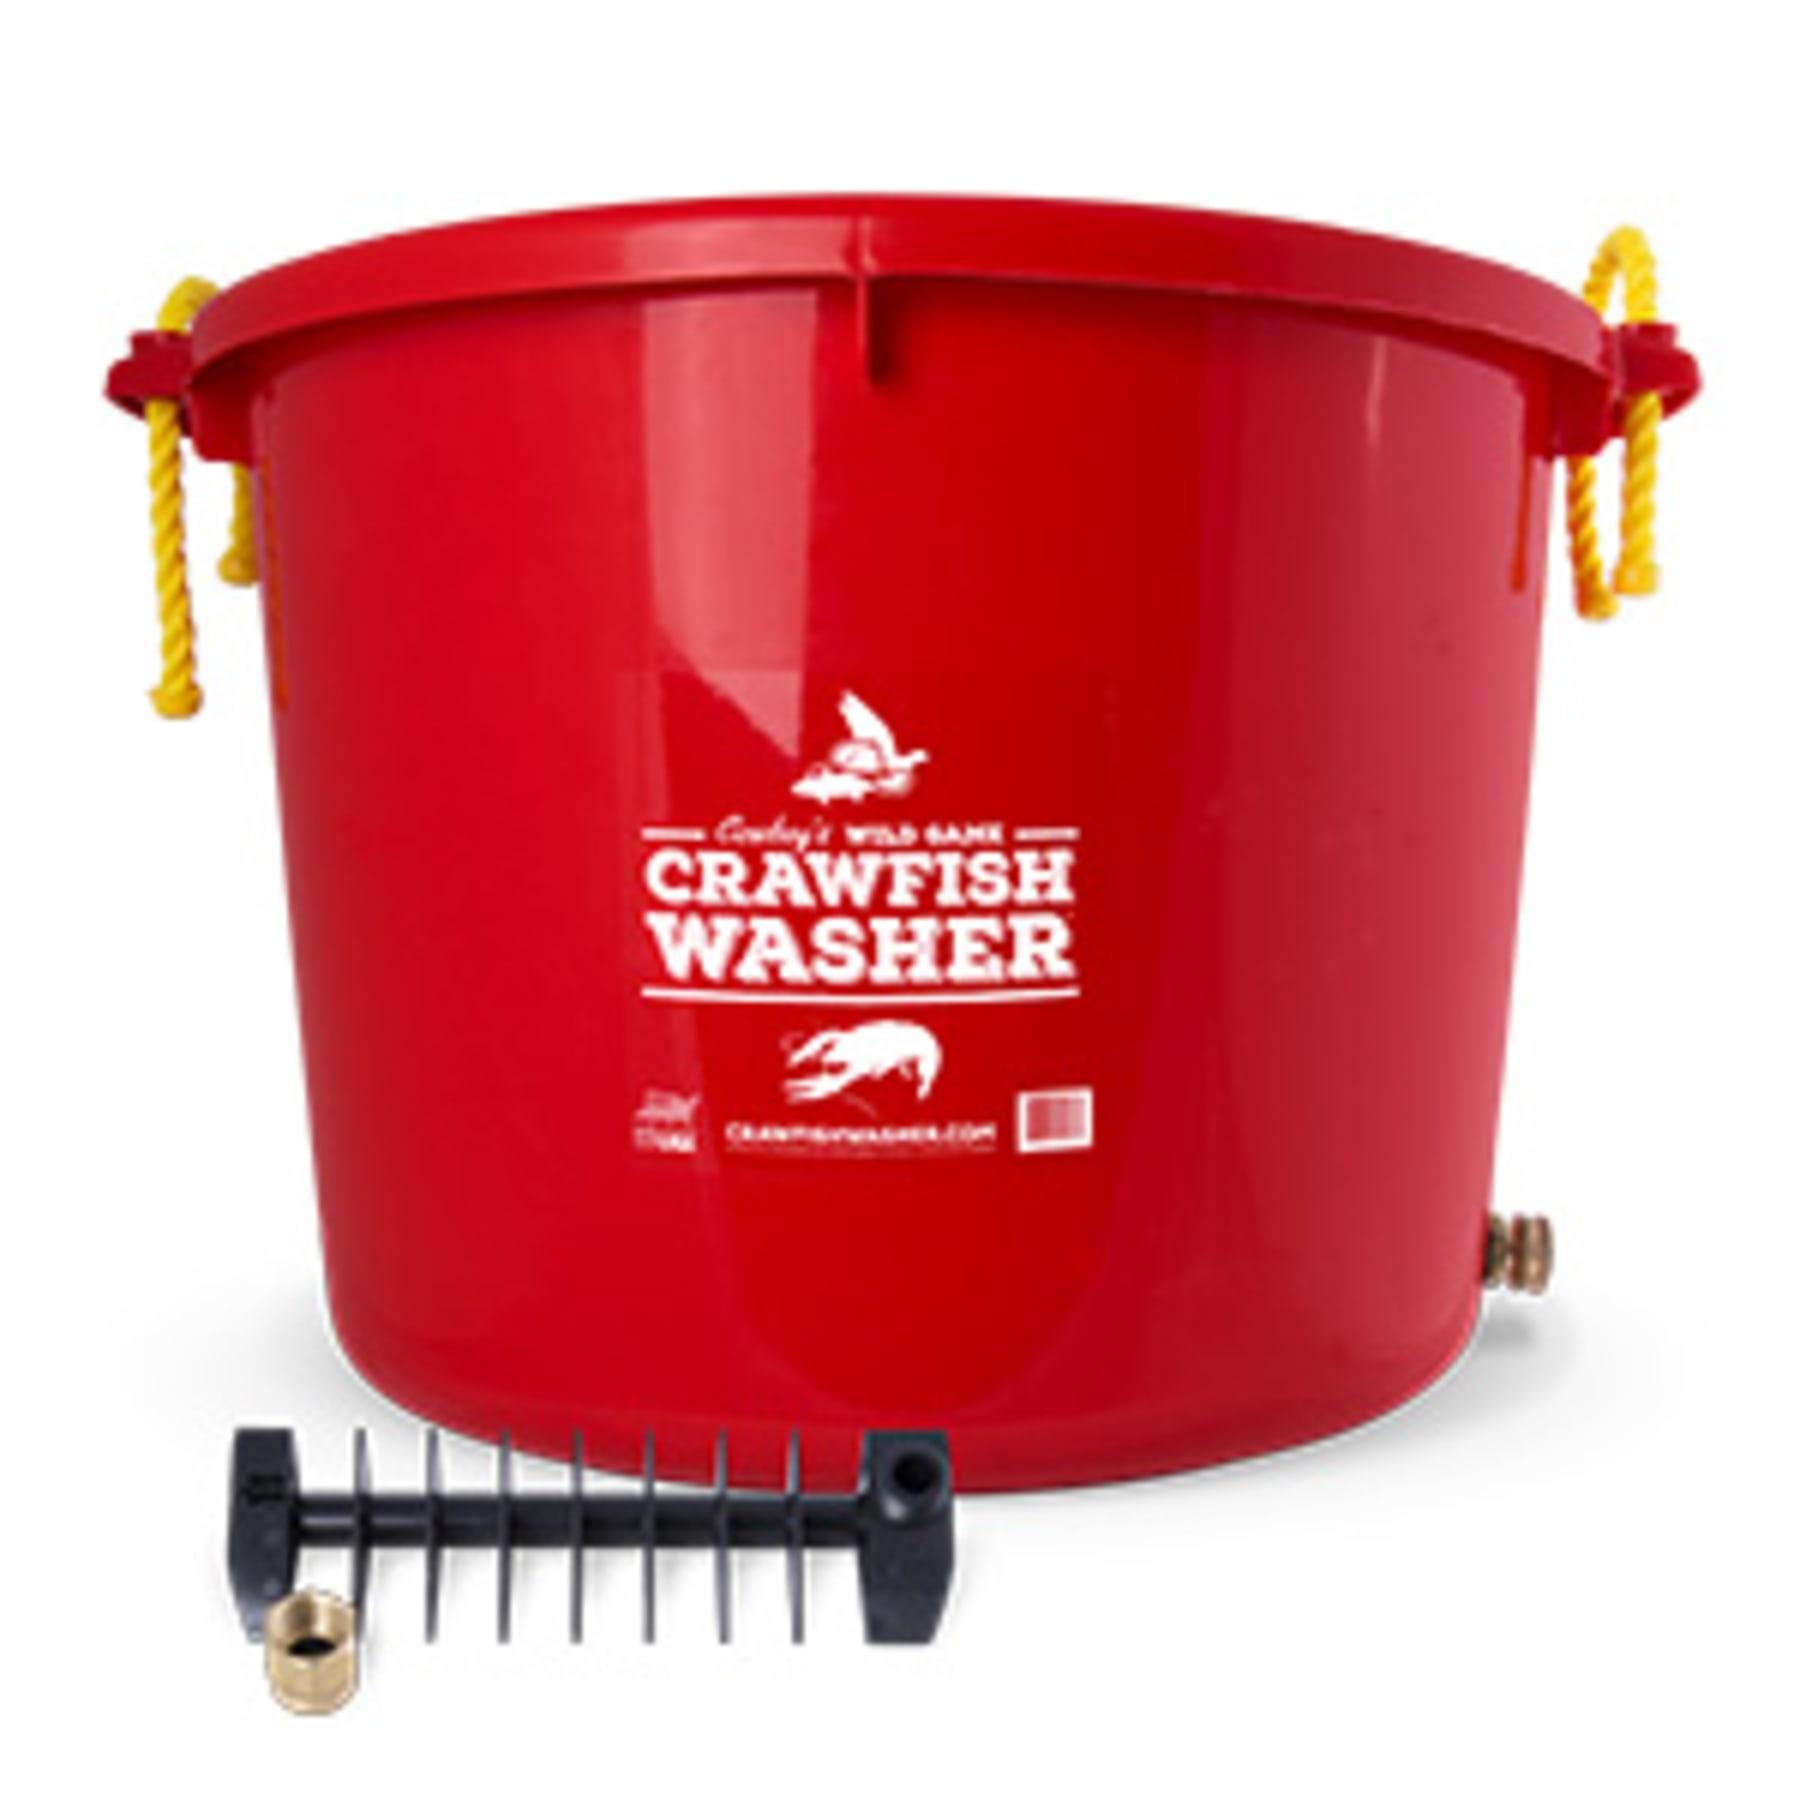 Crawfish Washer